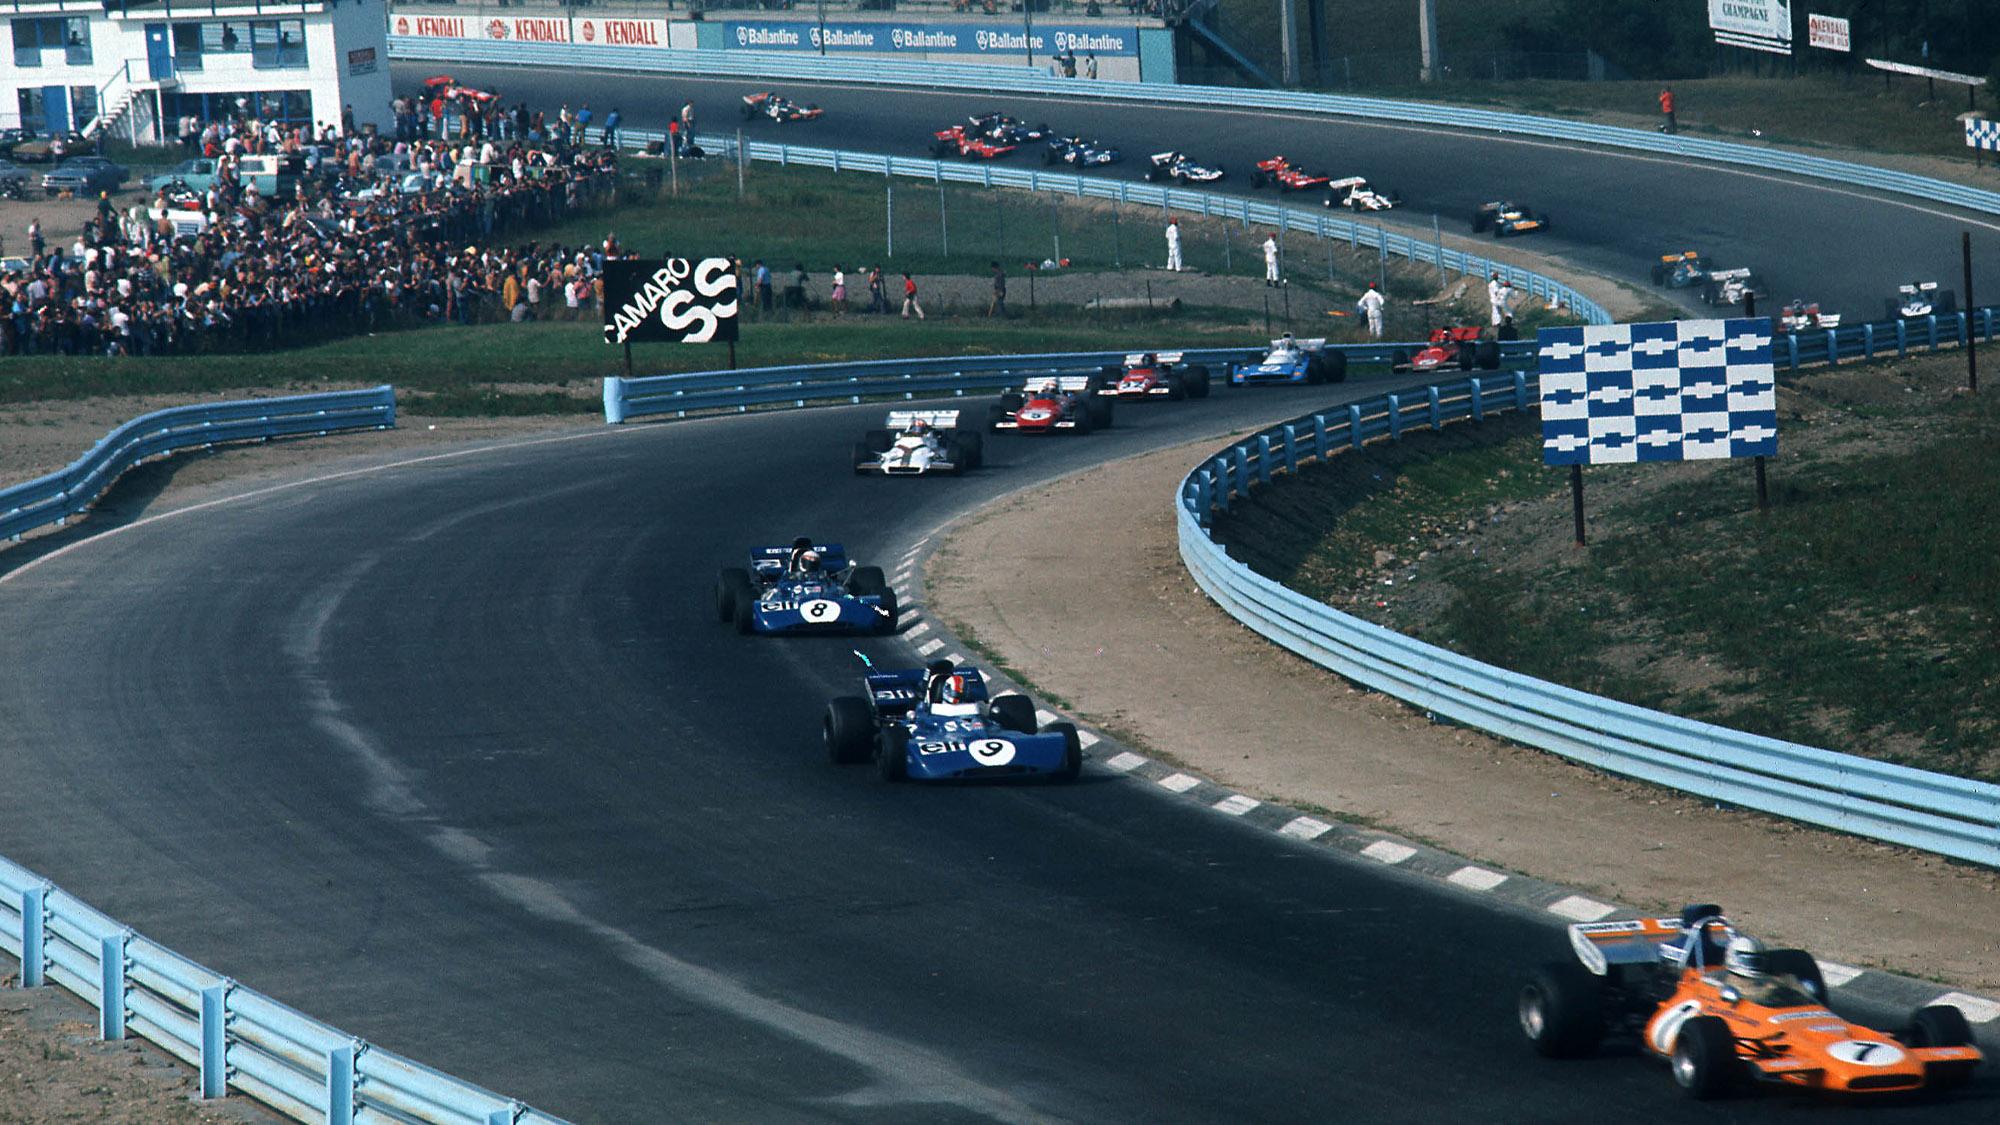 1971 Watkins Glen Grand Prix